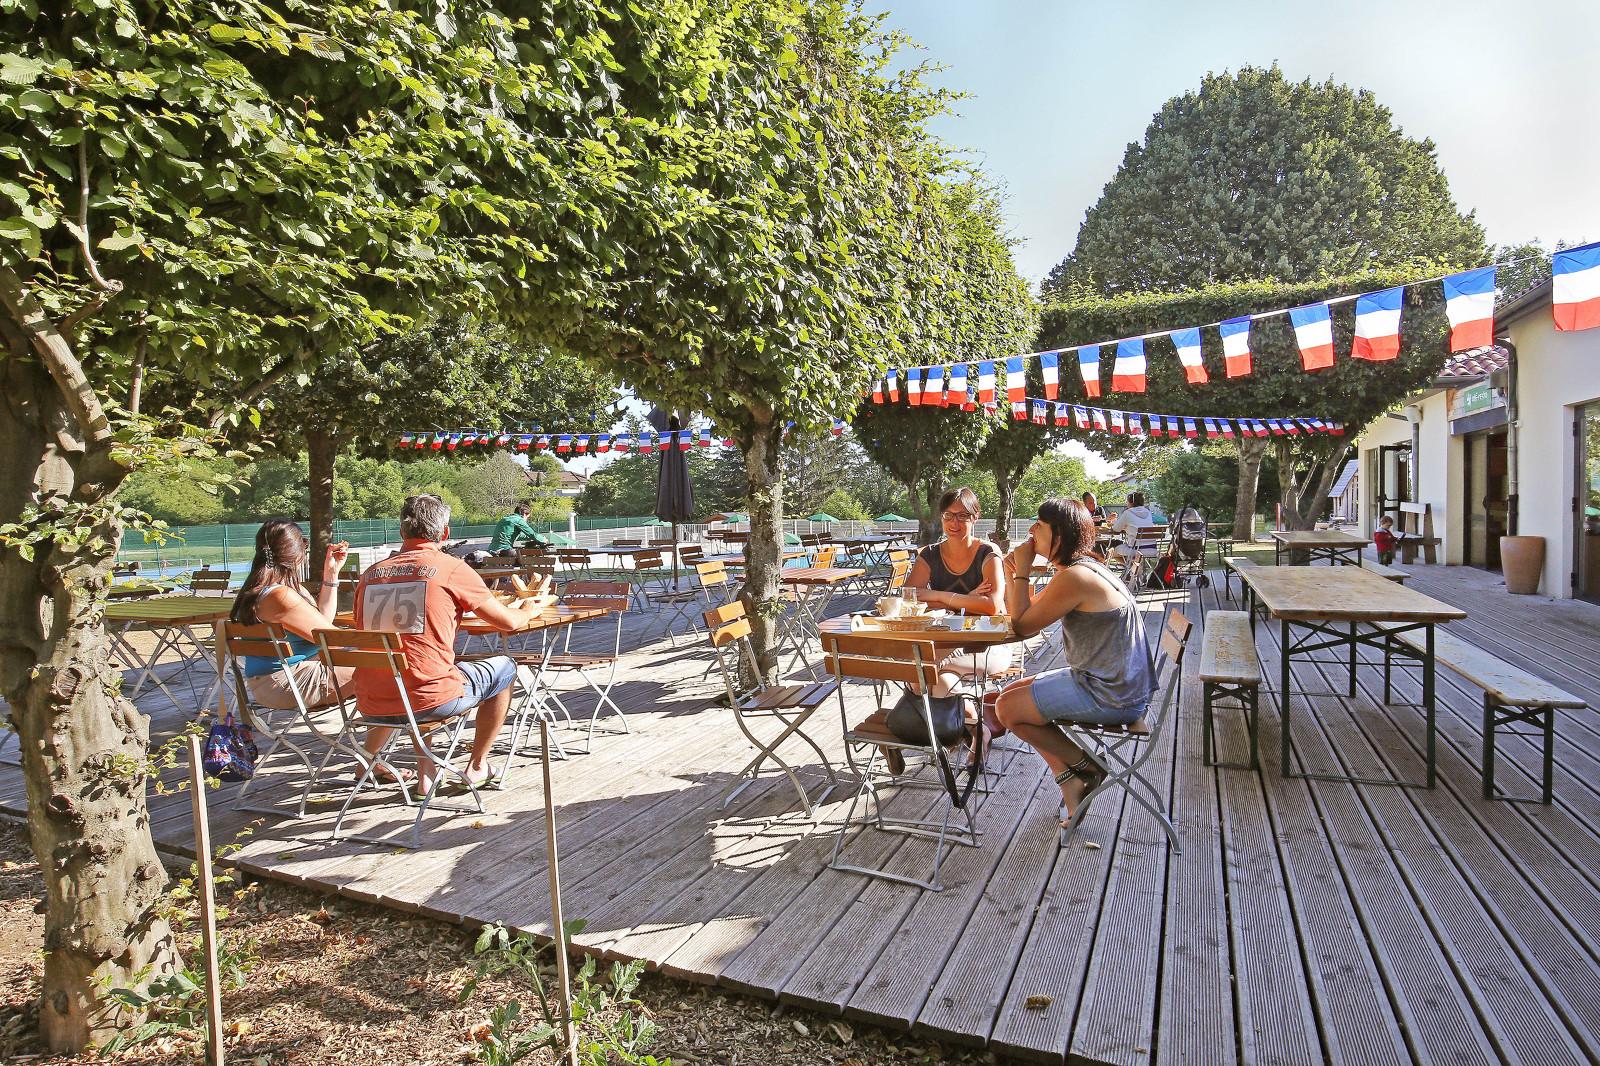 Camping Huttopia Royat, Royat, Puy-de-Dôme